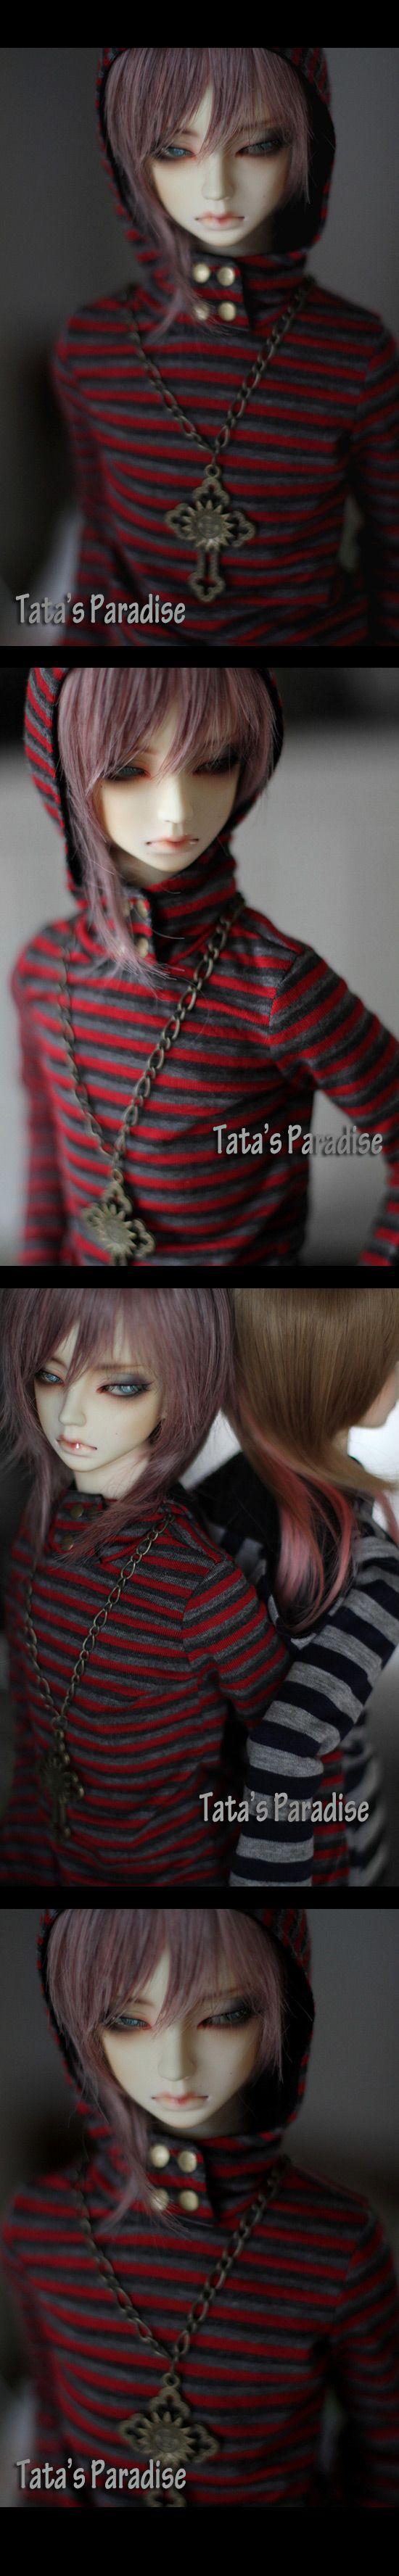 NO:LCT022 Reb_SD13/LUTS/DOT/AA/AS/LATI Boy Outfits_TA·CLOTHES_TATA'S PARADISE